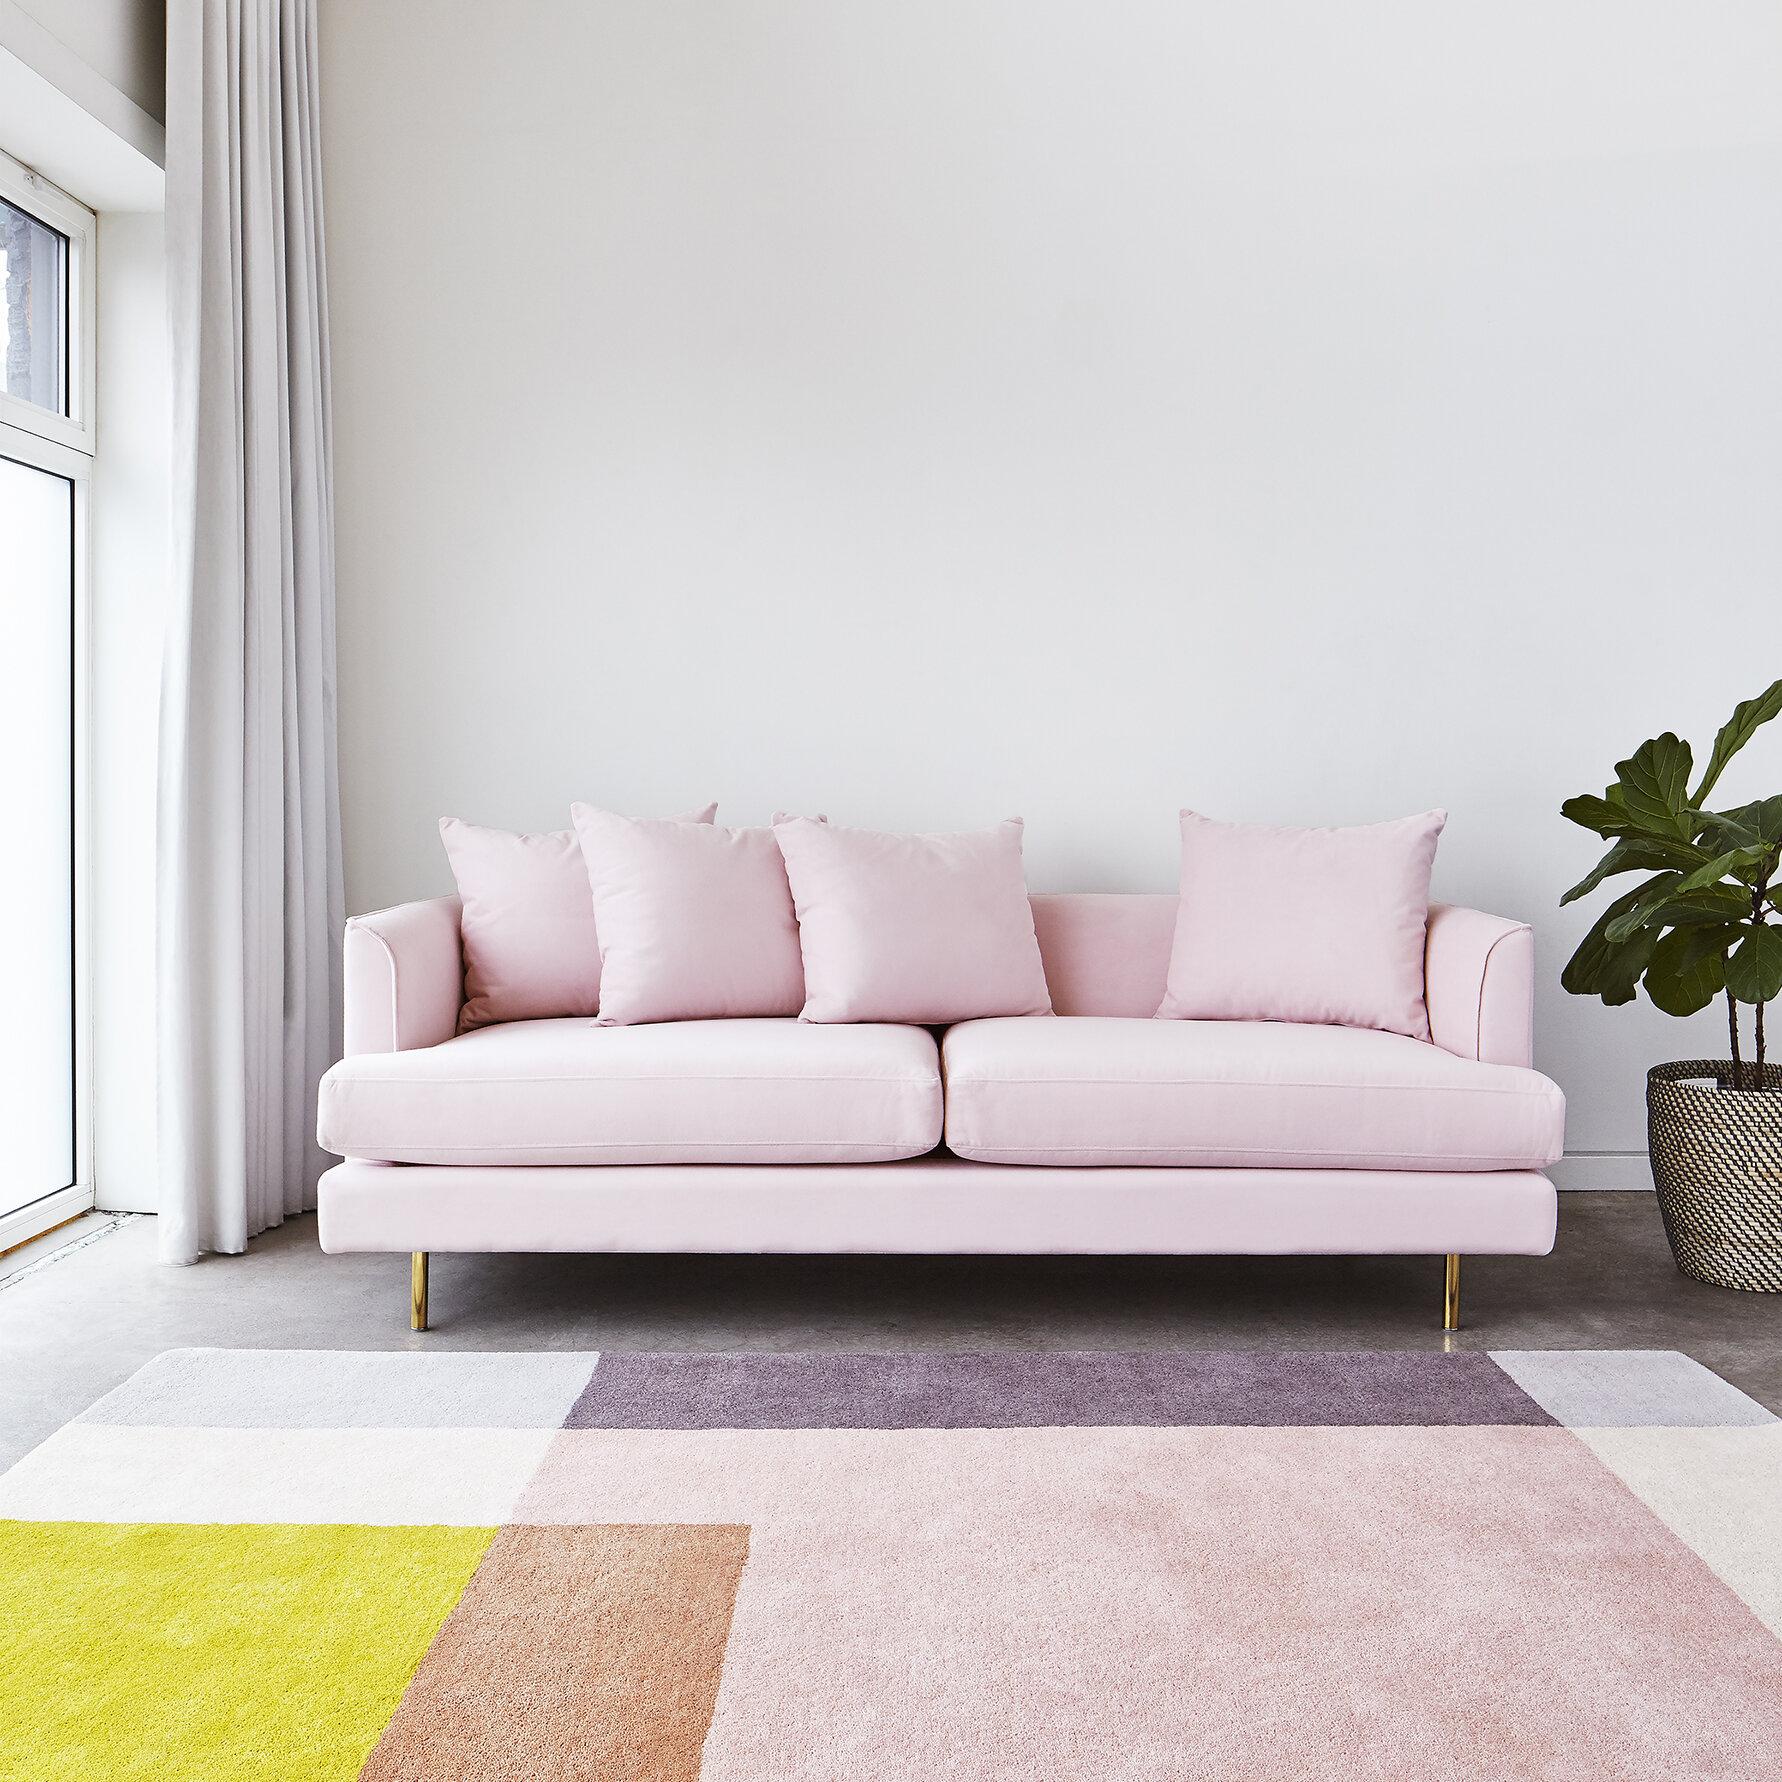 Gus modern margot sofa reviews wayfair ca